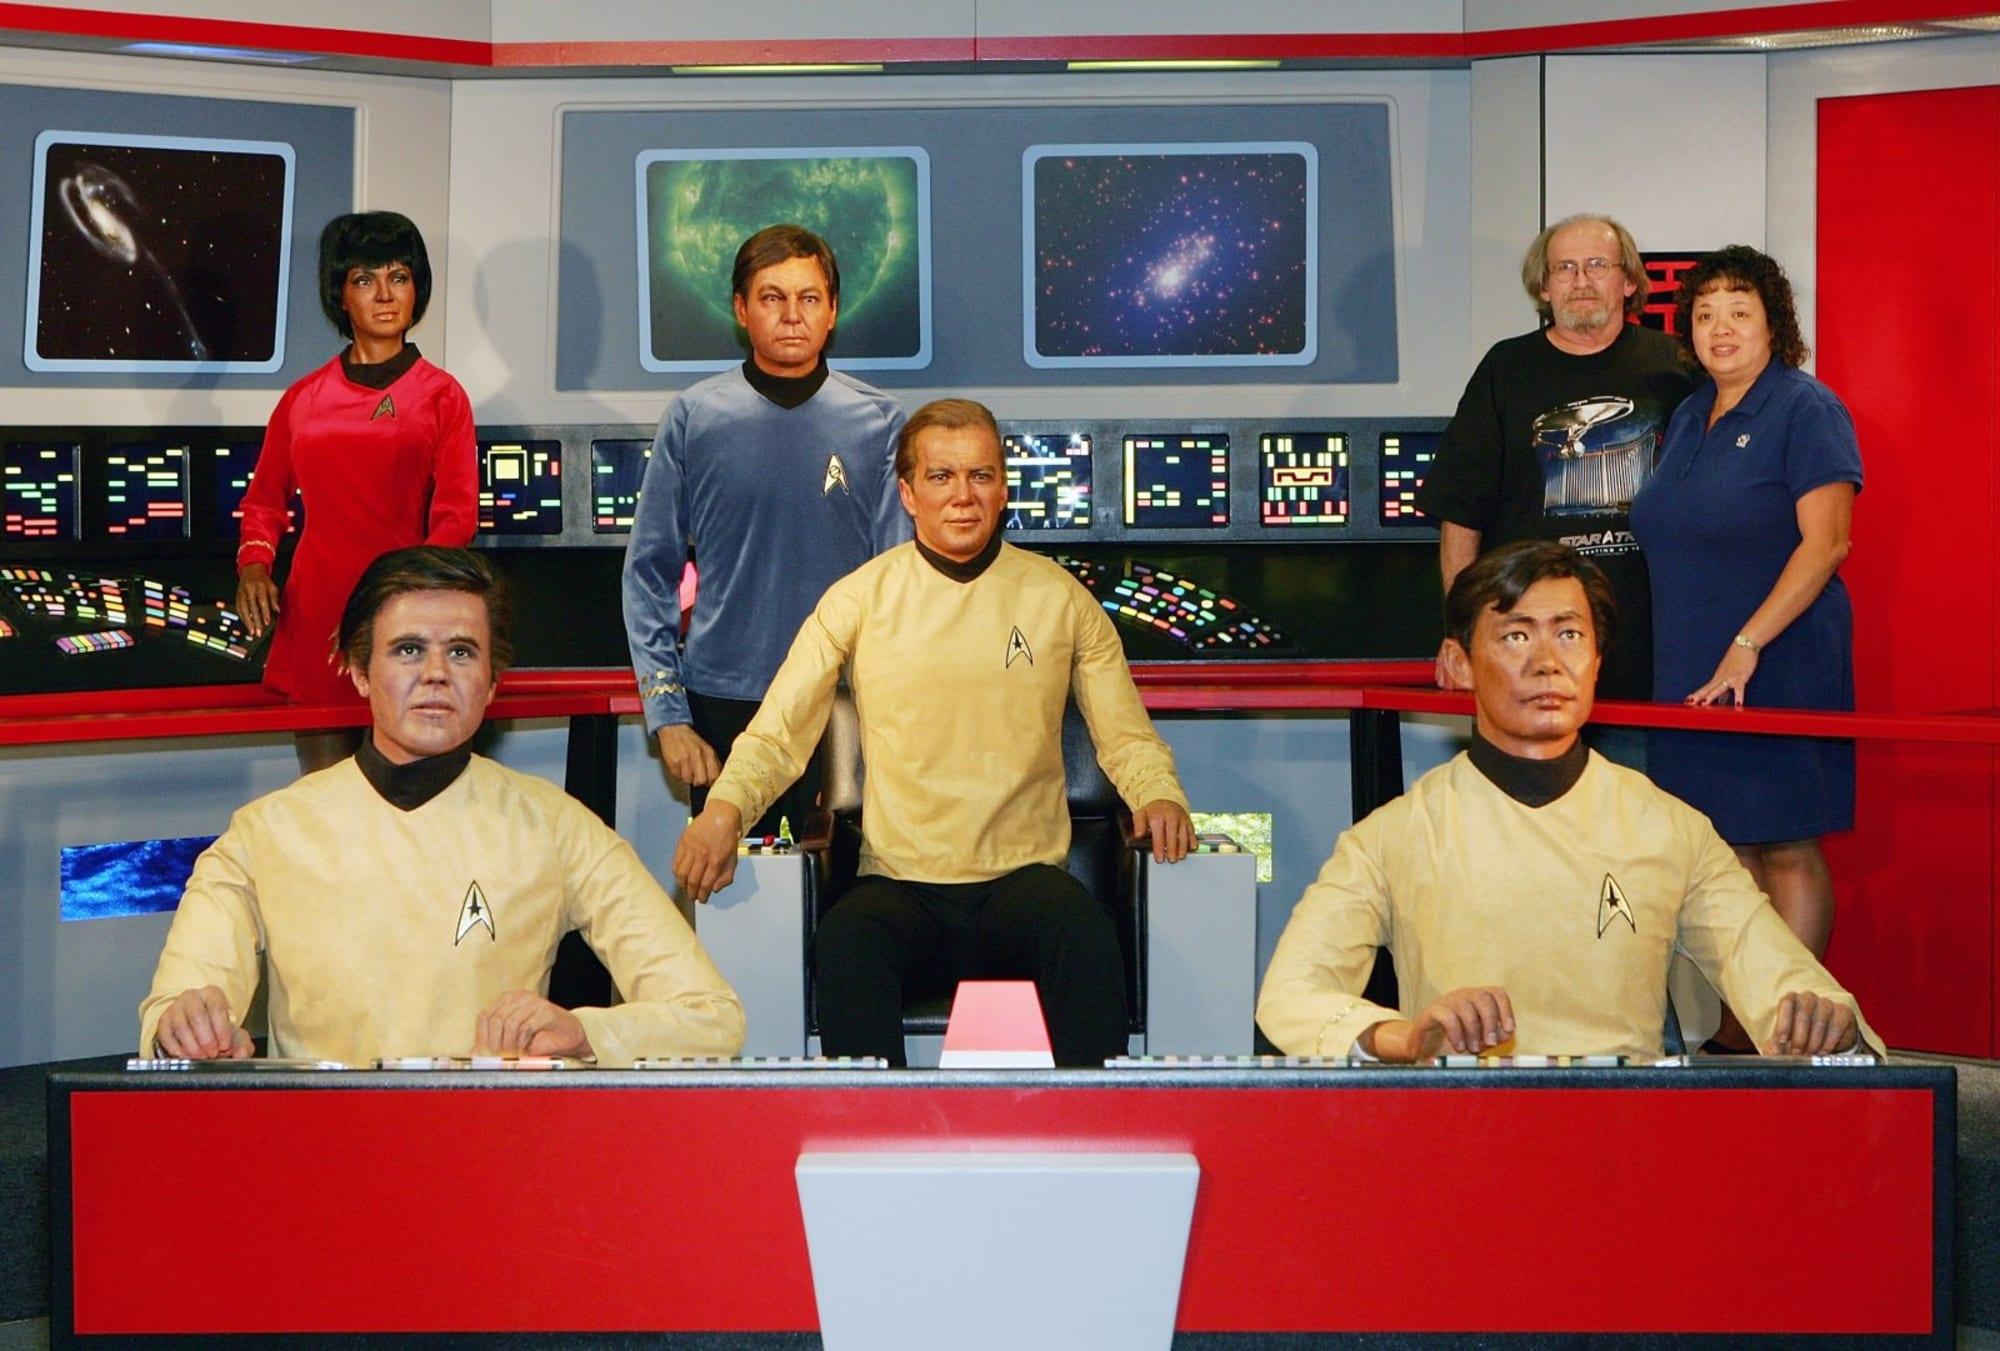 SyFy's Warp Factor gives Star Trek fans a good look at Captain Pike so far